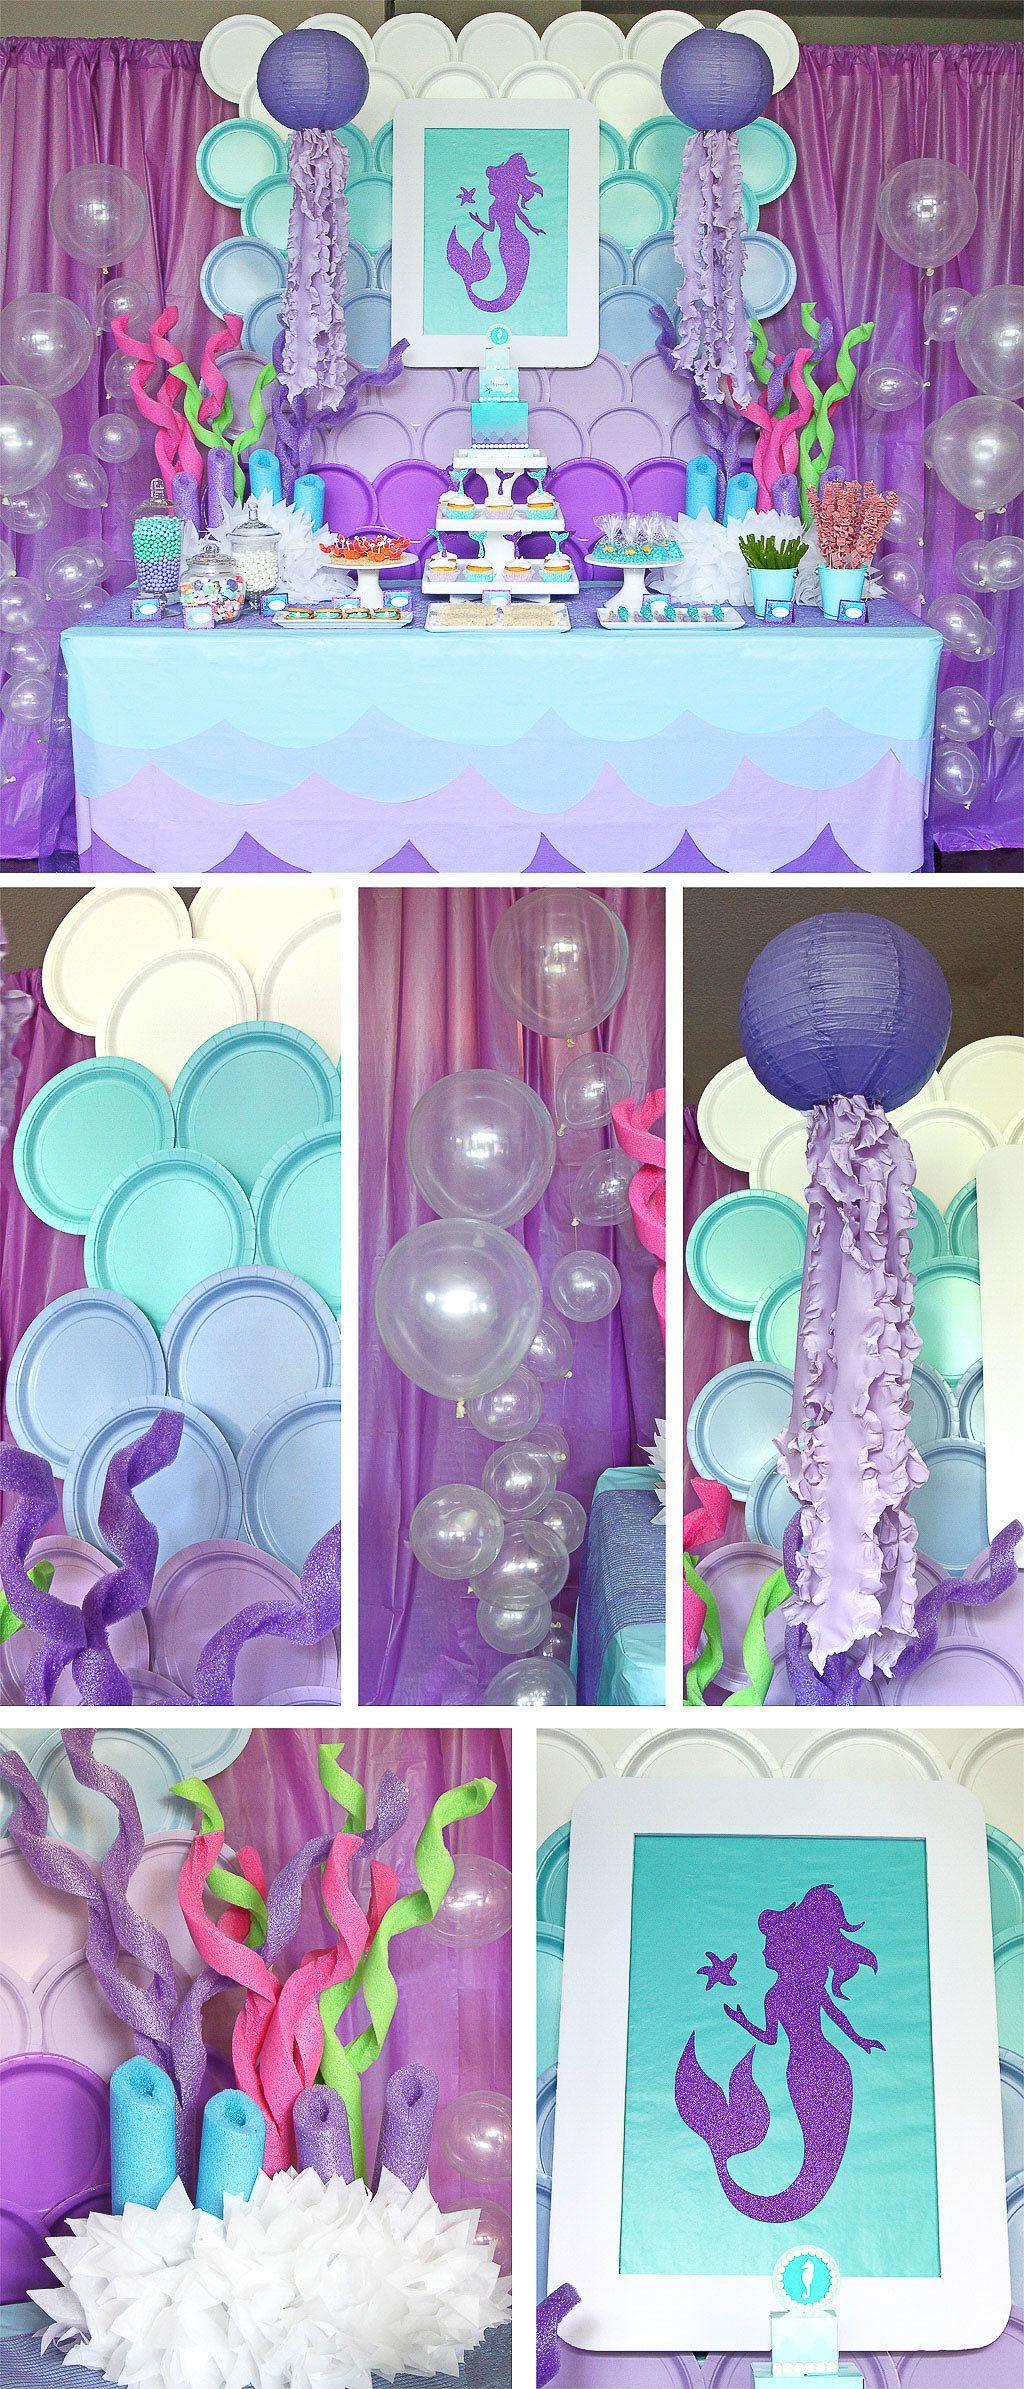 Mermaid Party Theme Ideas  Mermaid Party Ideas